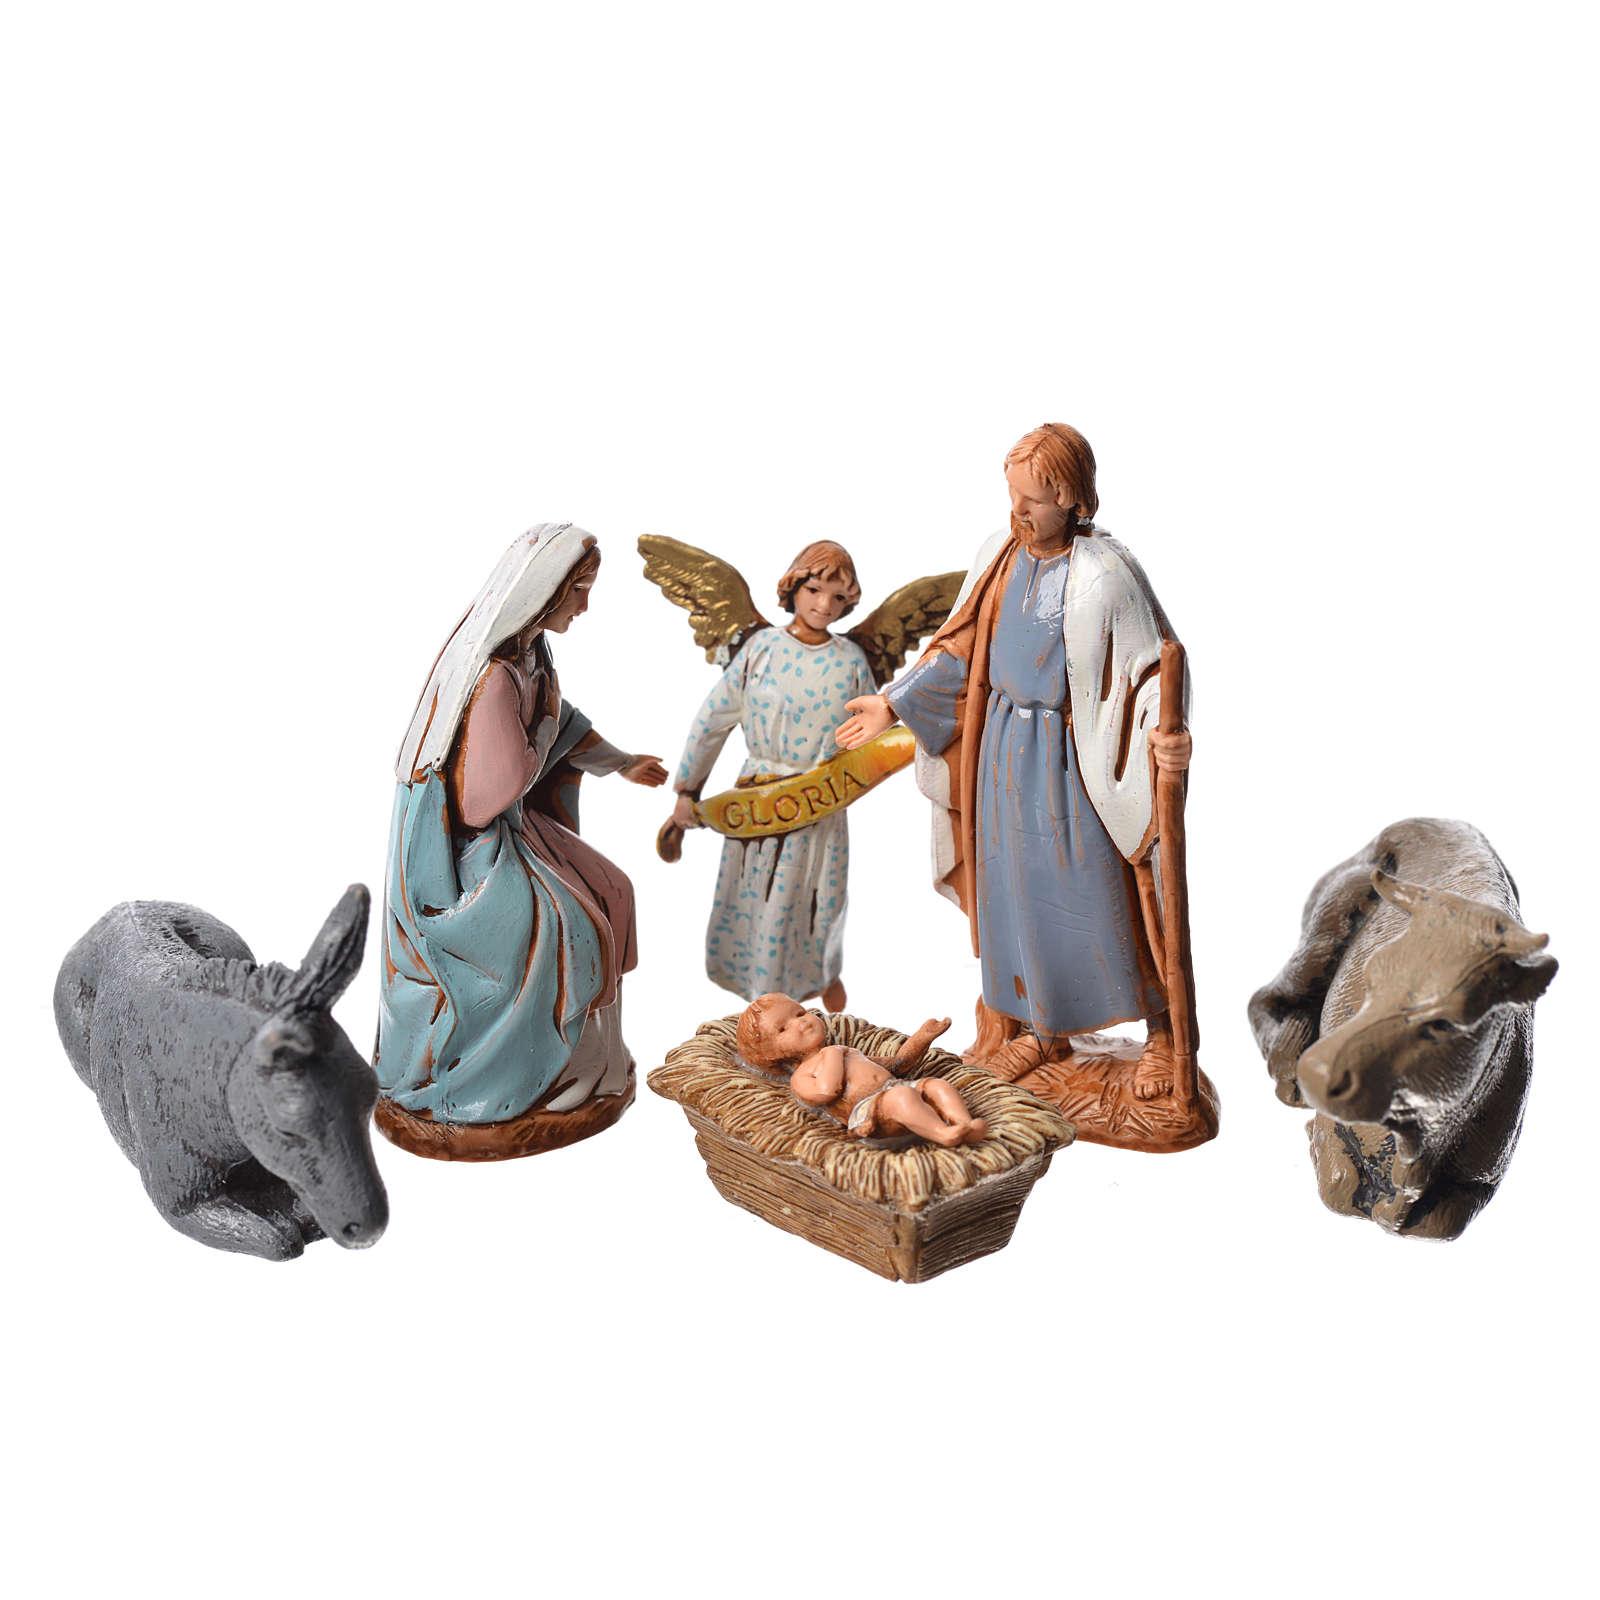 Natividad, 6 pdz, estilo árabe, para belén de Moranduzzo con estatuas de 6,5 cm 4